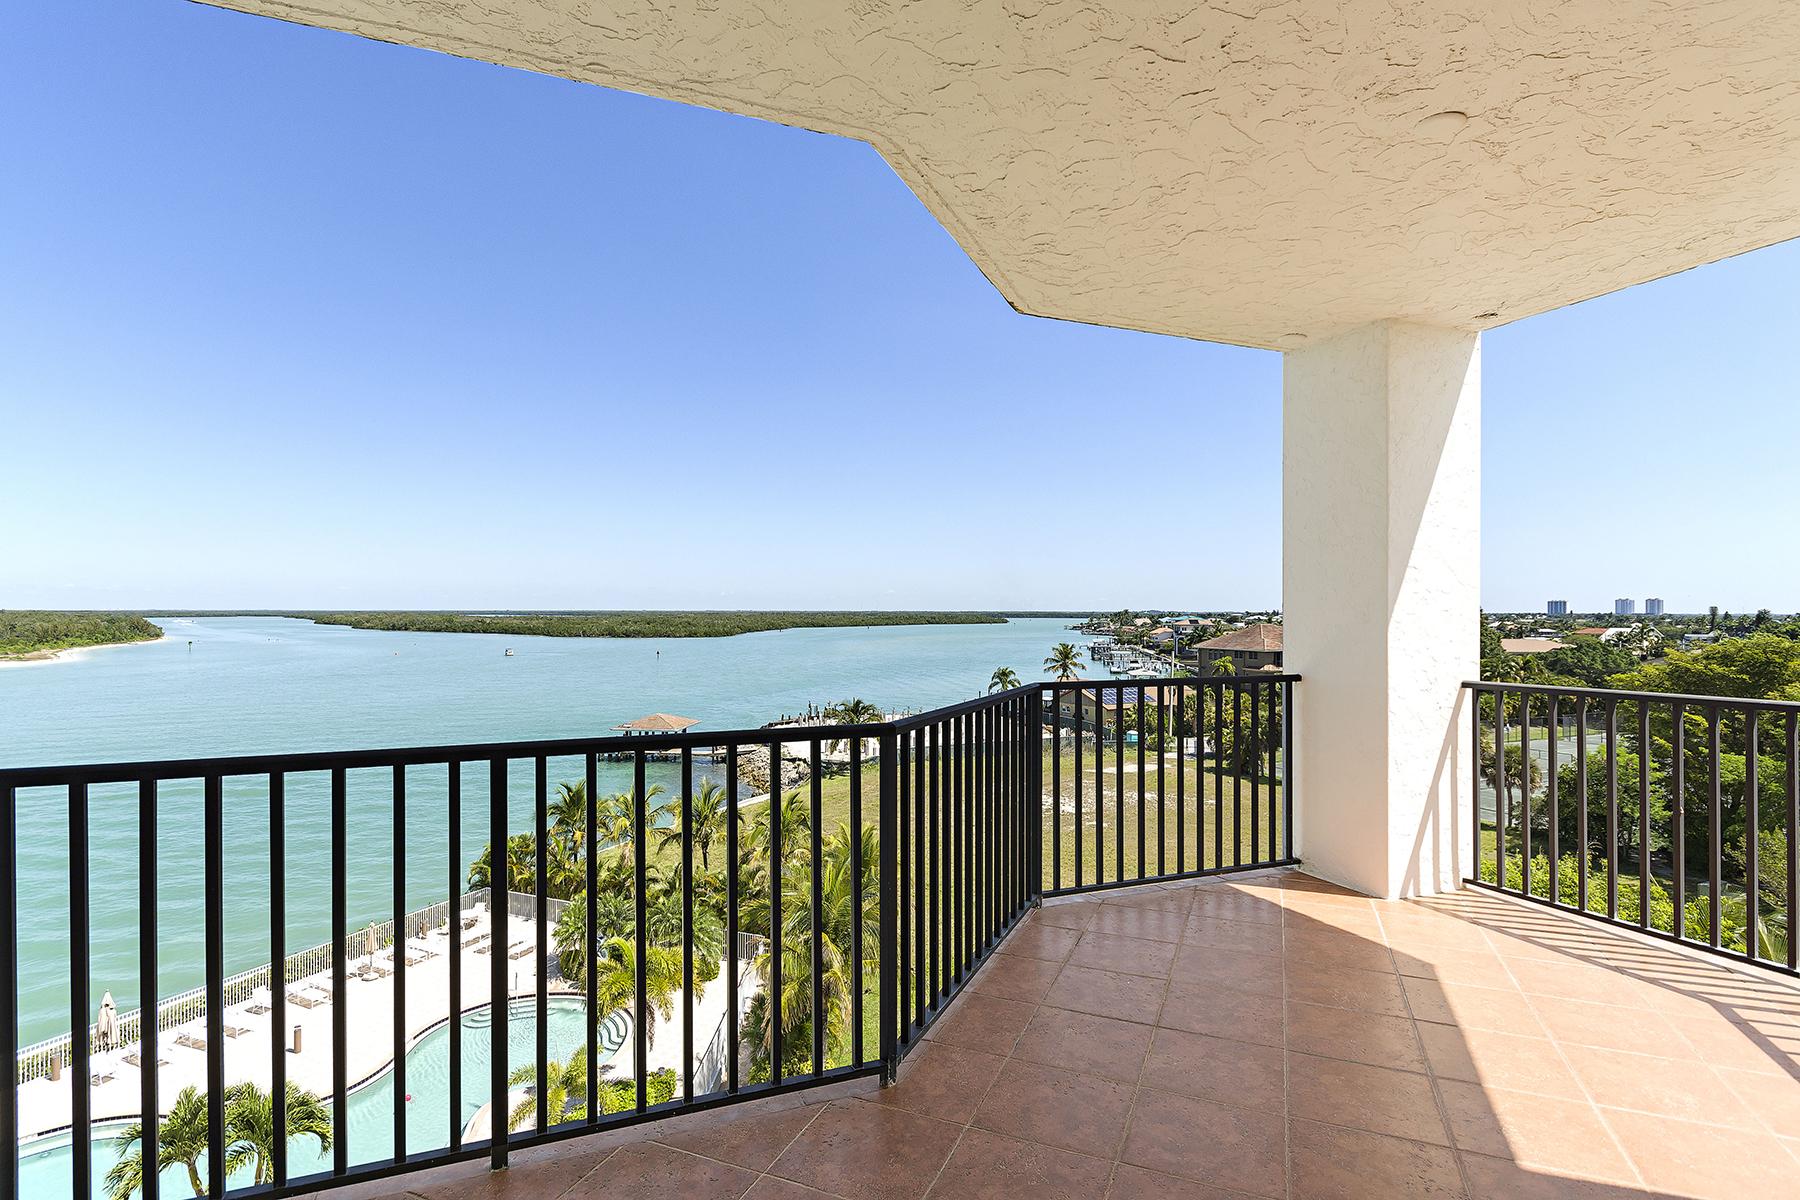 Condomínio para Venda às ISLES OF CAPRI - TWIN DOLPHINS 700 La Peninsula Blvd 506 Naples, Florida, 34113 Estados Unidos